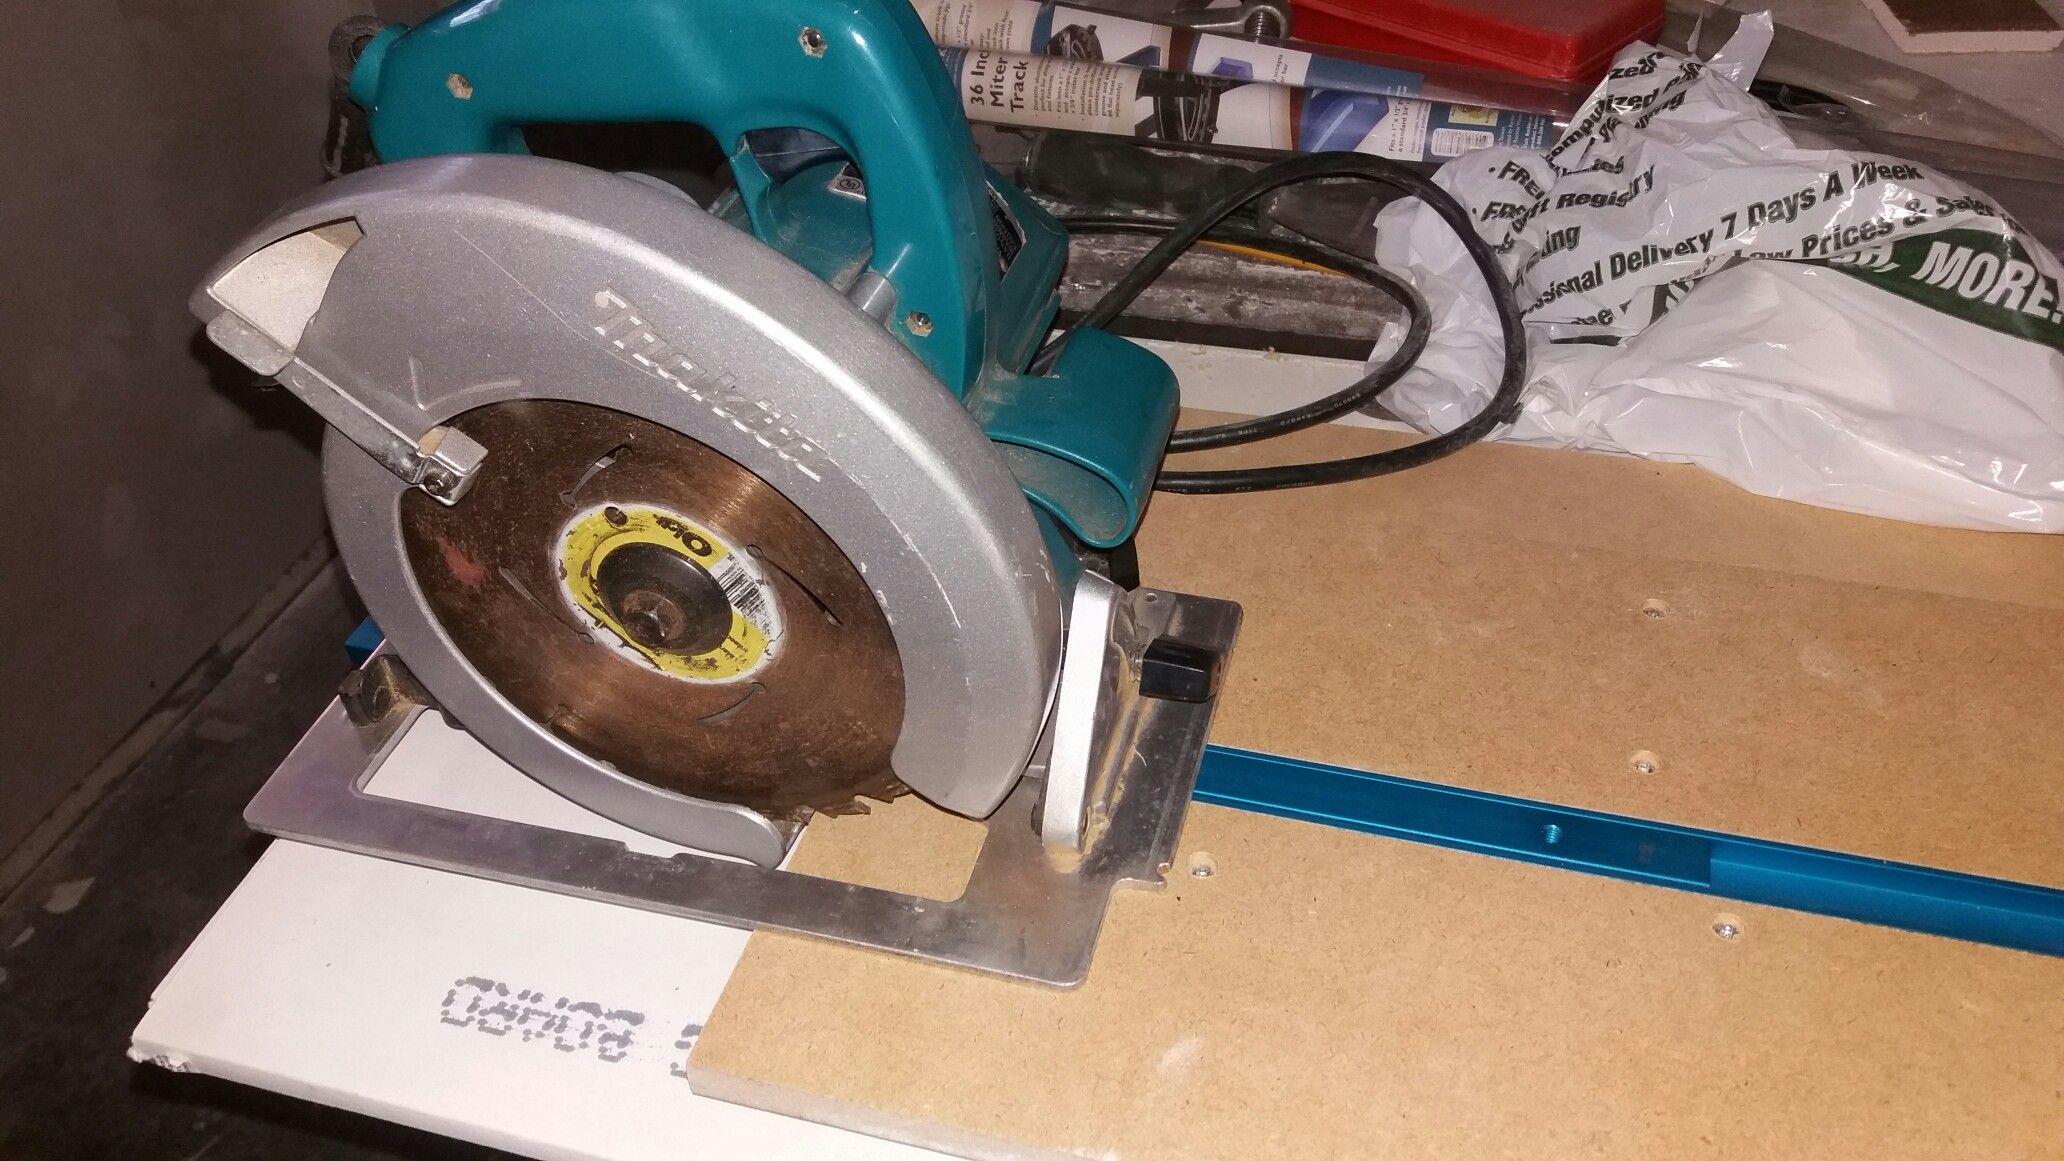 Convert A Circular Saw Into A Track Saw Circular Saw Workshop Circular